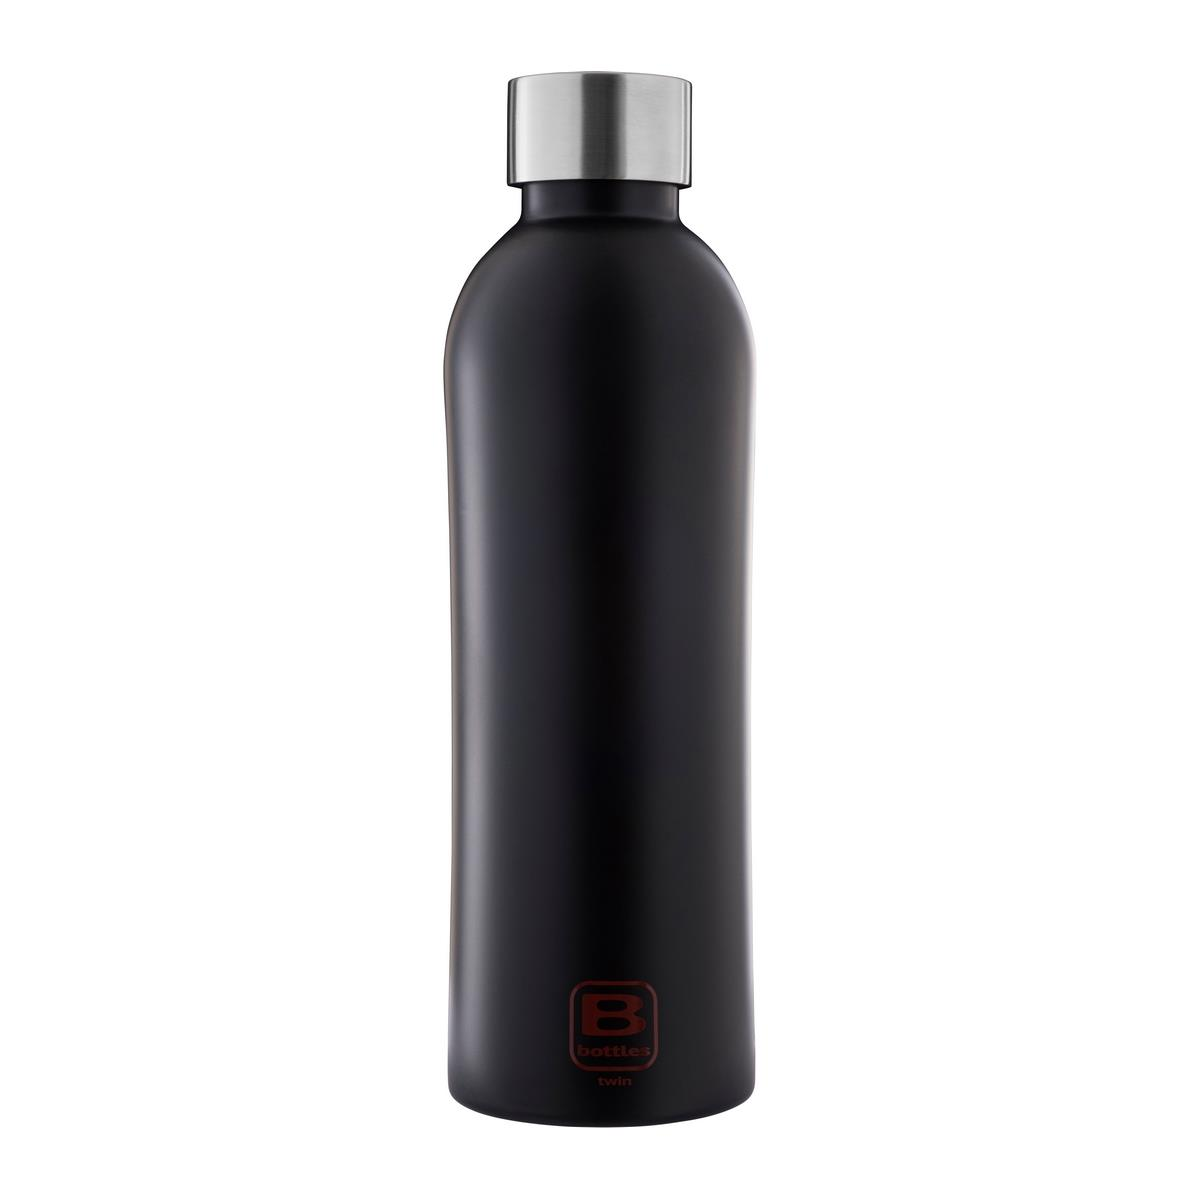 B Bottles Twin - Nero Opaco - 800 ml - Bottiglia Termica a doppia parete in acciaio inox 18/10